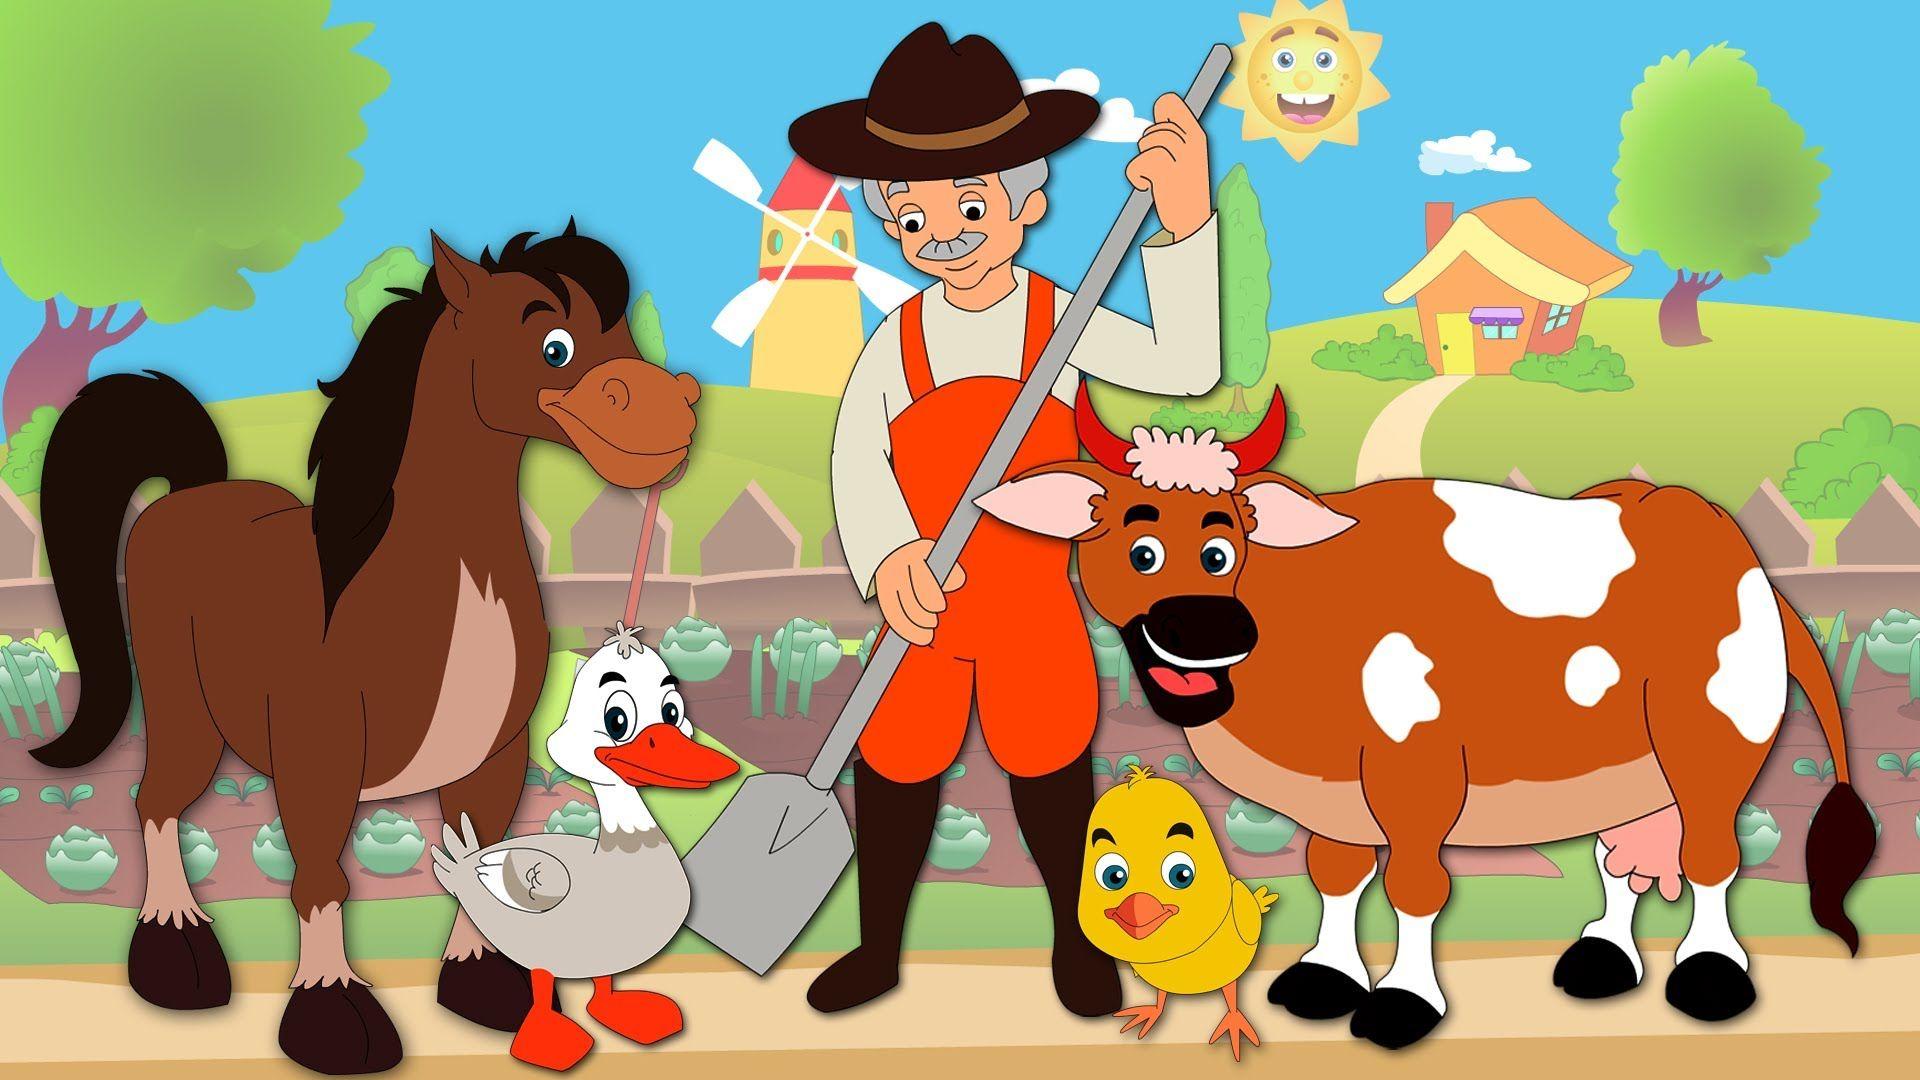 Old Macdonald Animal Sound Song Old Macdonald Had A Farm Nursery Rhyme Nursery Songs Nursery Rhymes Rhymes For Kids